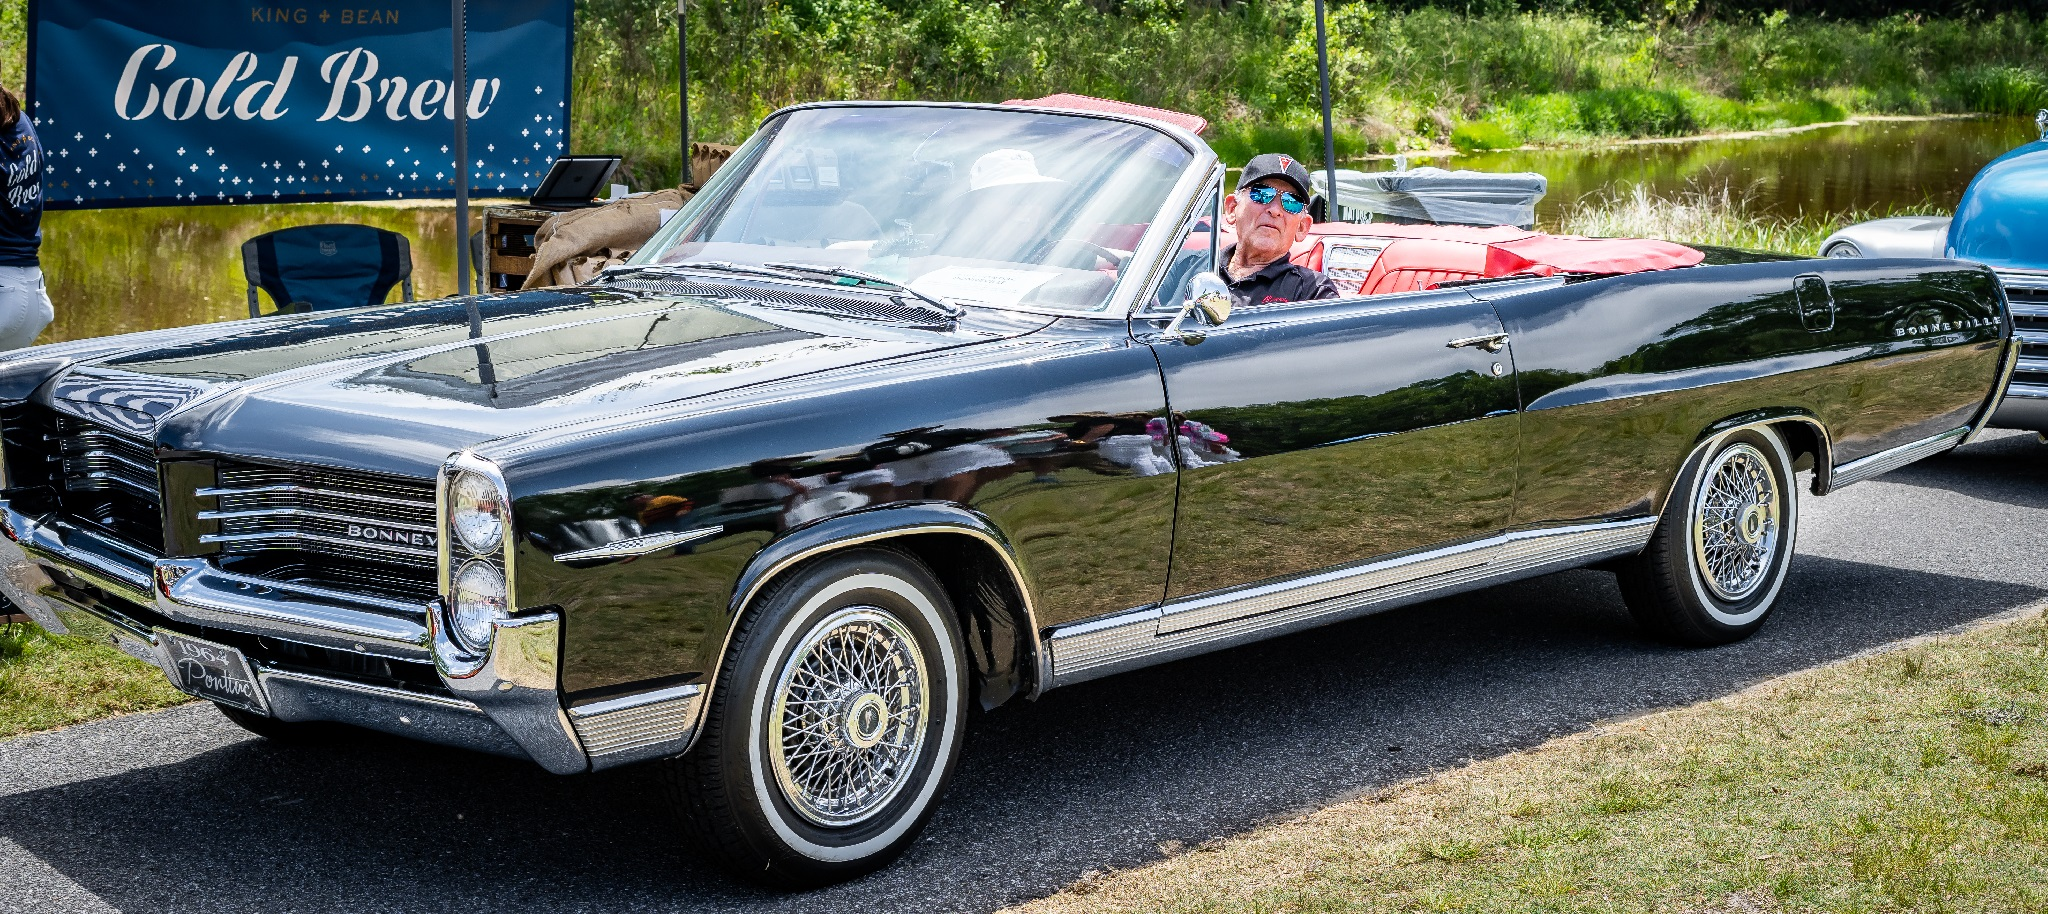 Class Award American - Michael Sudzina's '64 Pontiac Bonneville